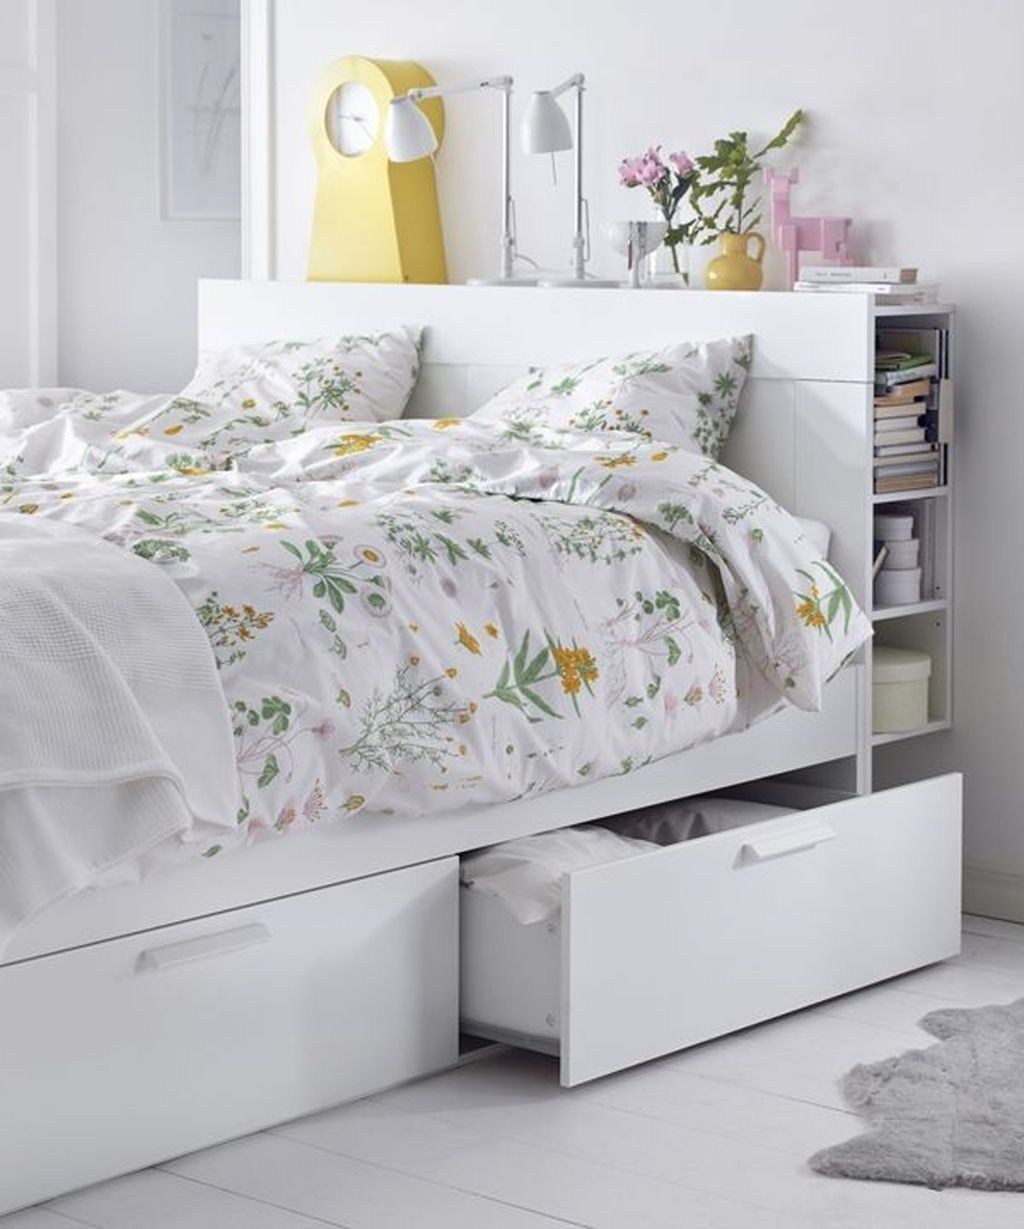 30+ Minimalist Bedroom Design Storage Organization Ideas ...